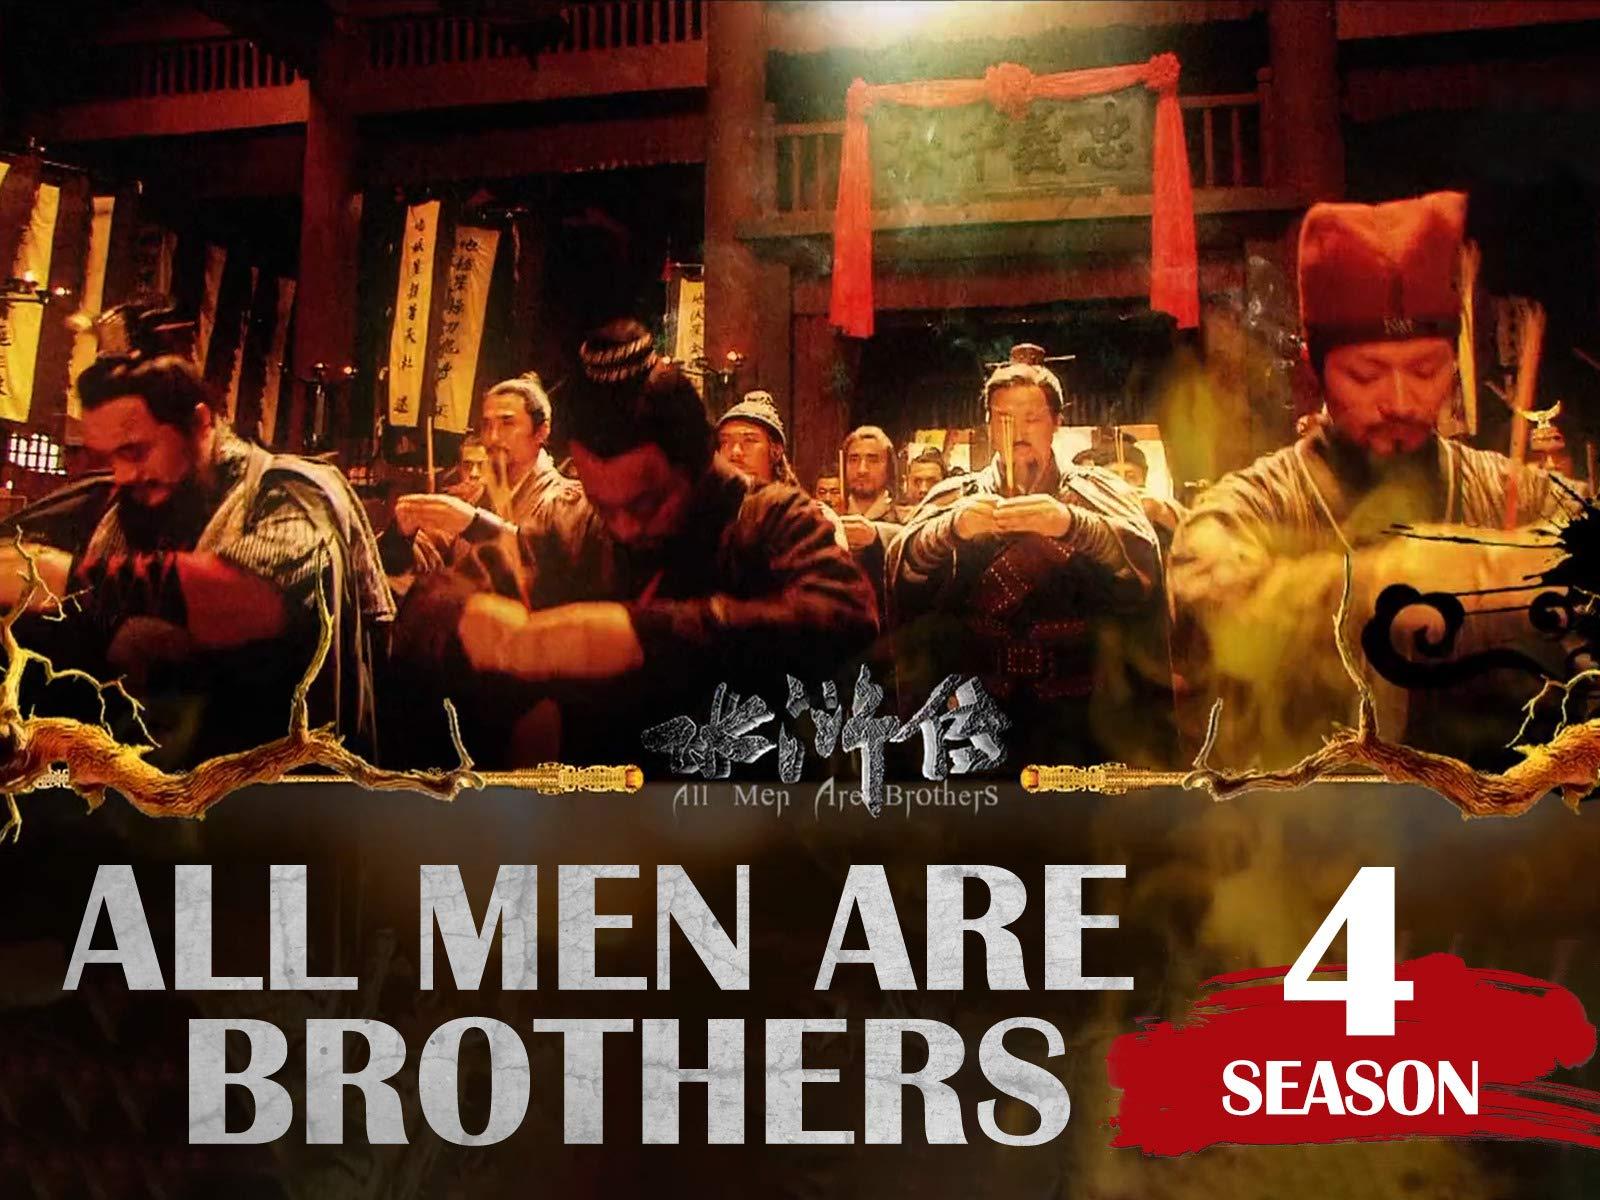 All Men are Brothers Season 4 - Season 1